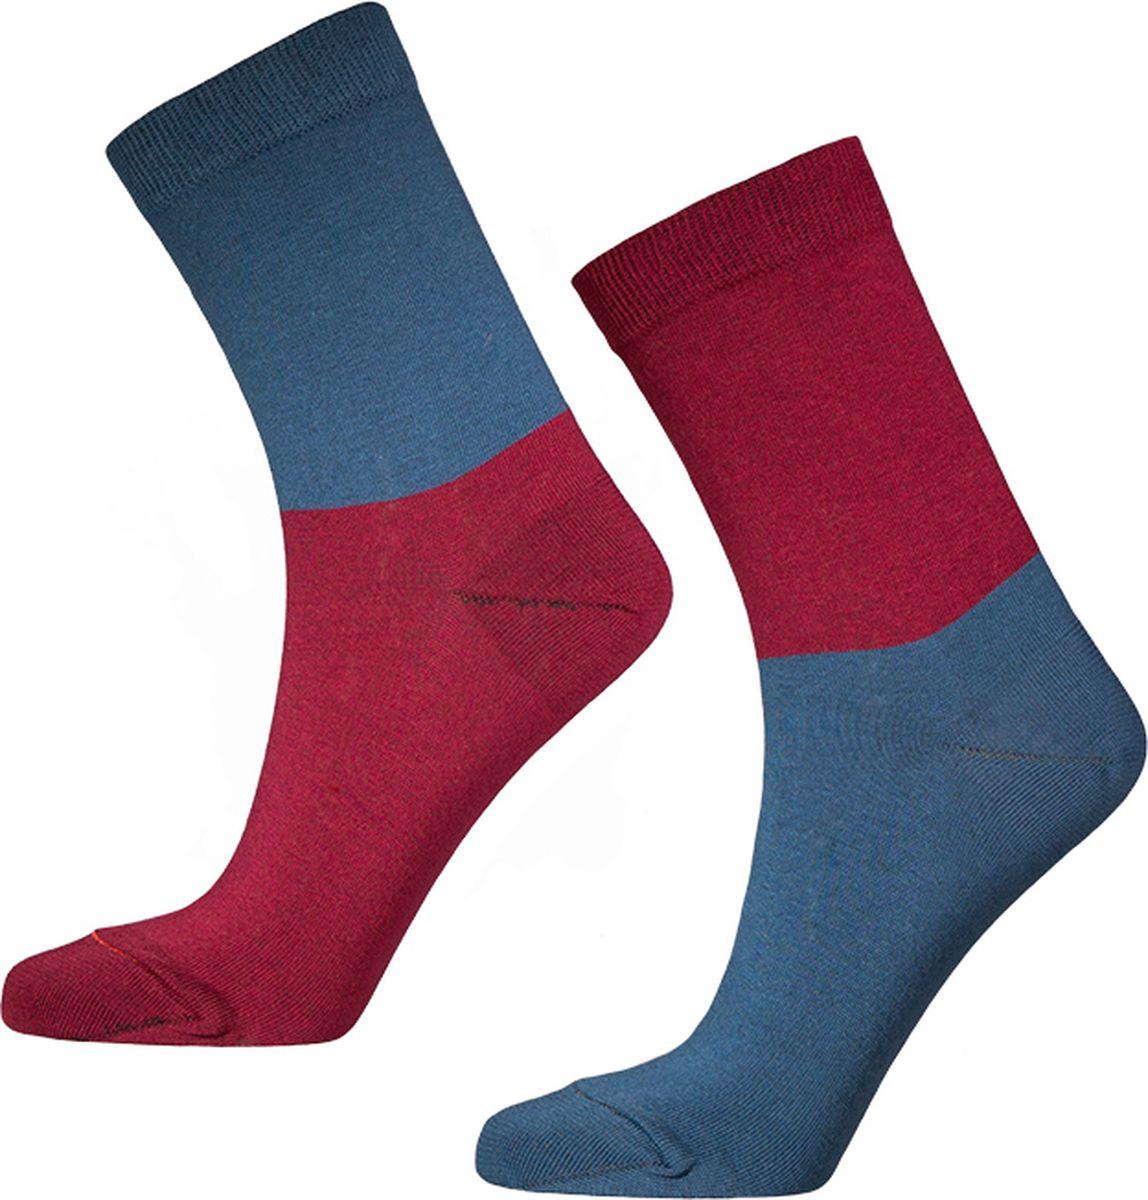 Носки мужские Big Bang Socks, цвет: джинсовый, бордовый, 2 пары. d471. Размер 40/44 носки minecraft socks 3 pack green зеленые s 3 пары 11750